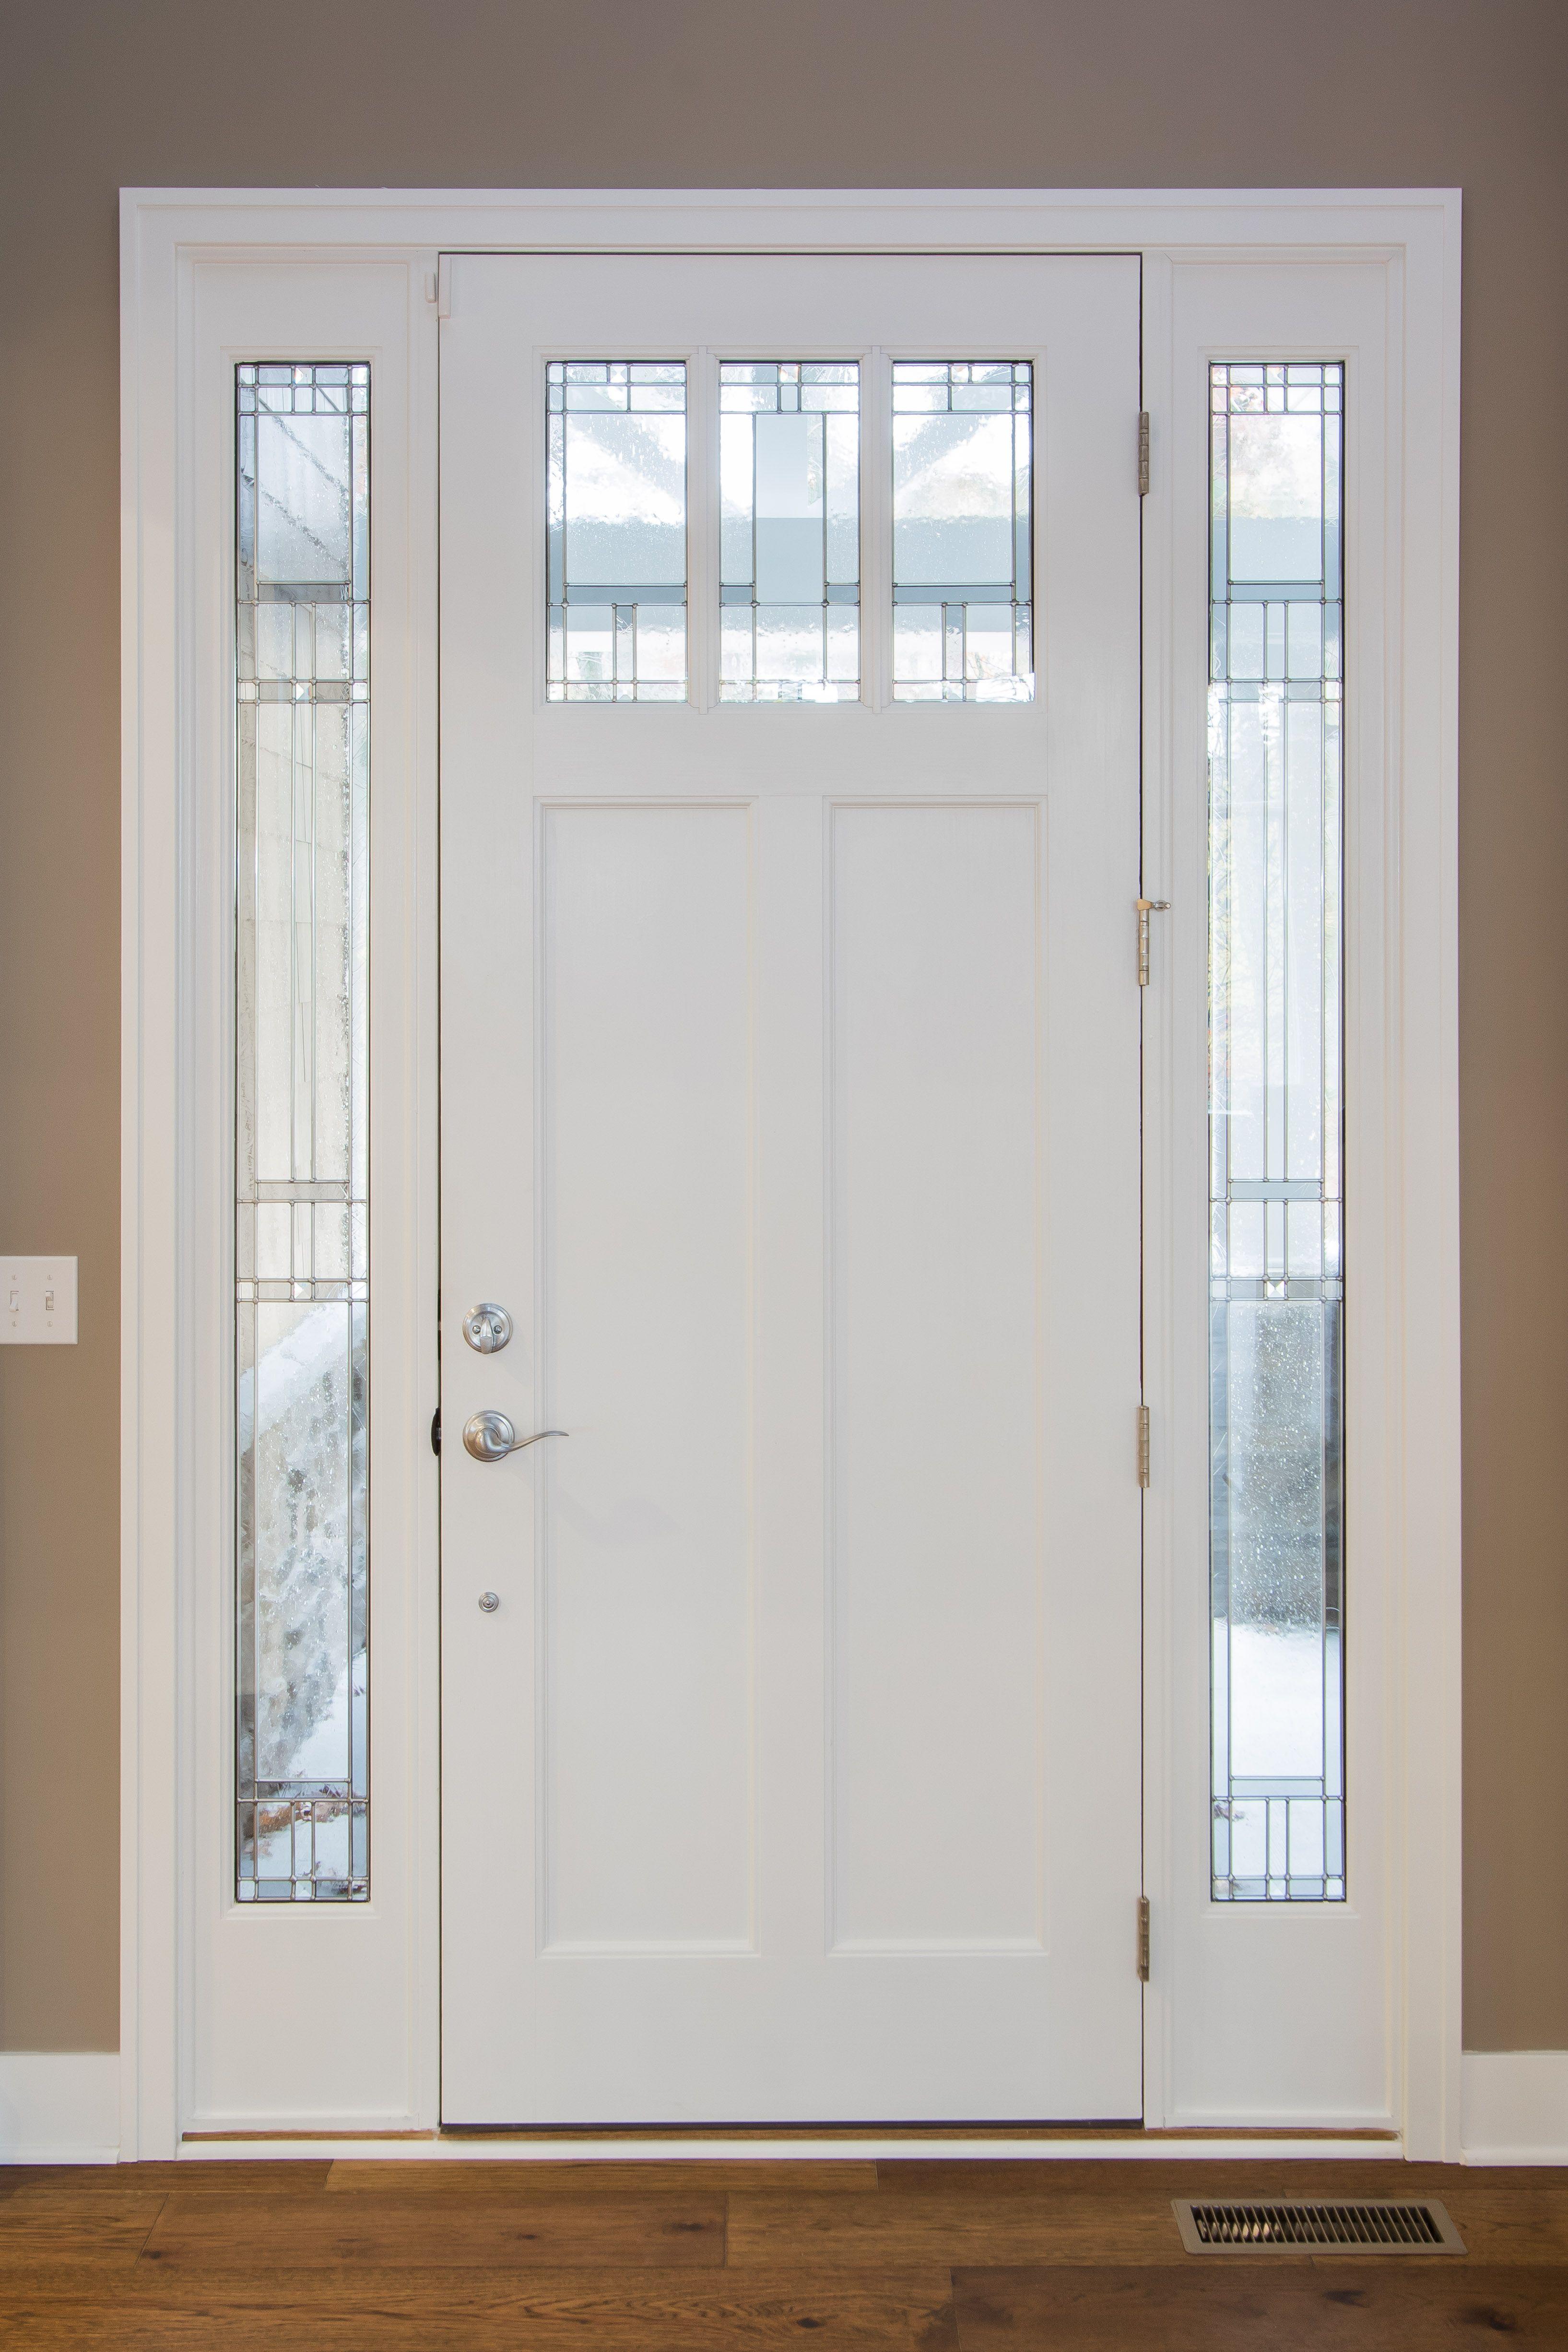 Entry Door Painted Trim, Decorative Glass Panels, Hardwood Floors